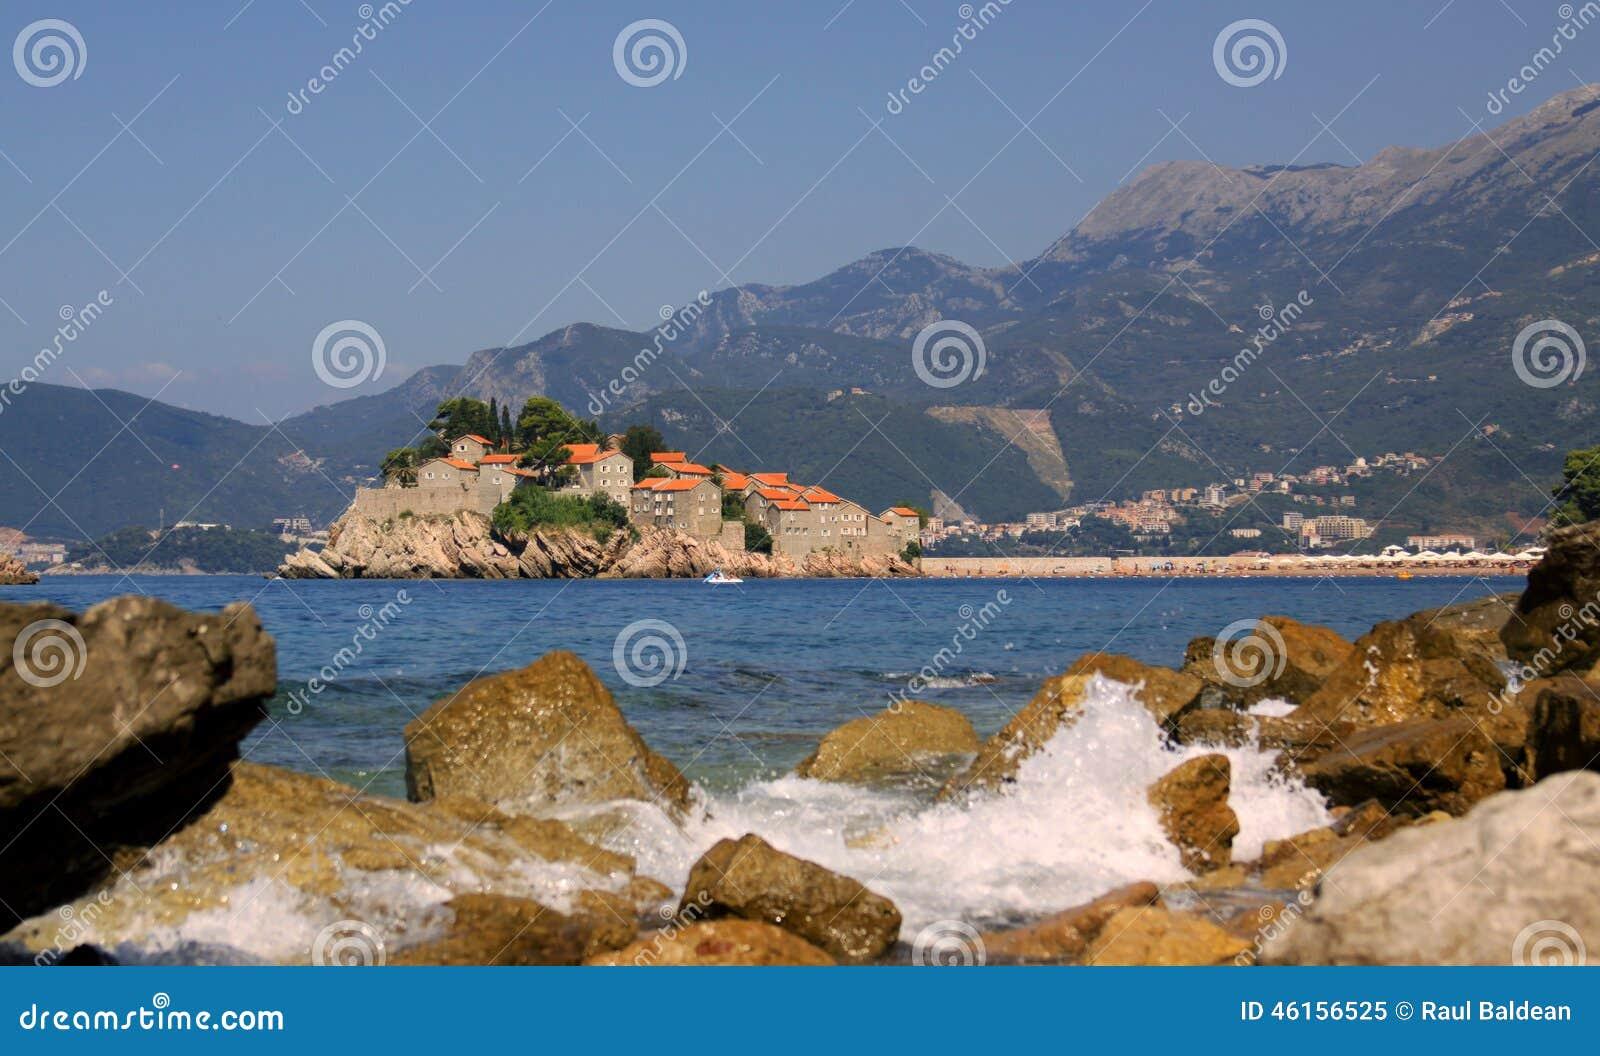 Sveti Stefan islet perspective, Montenegro